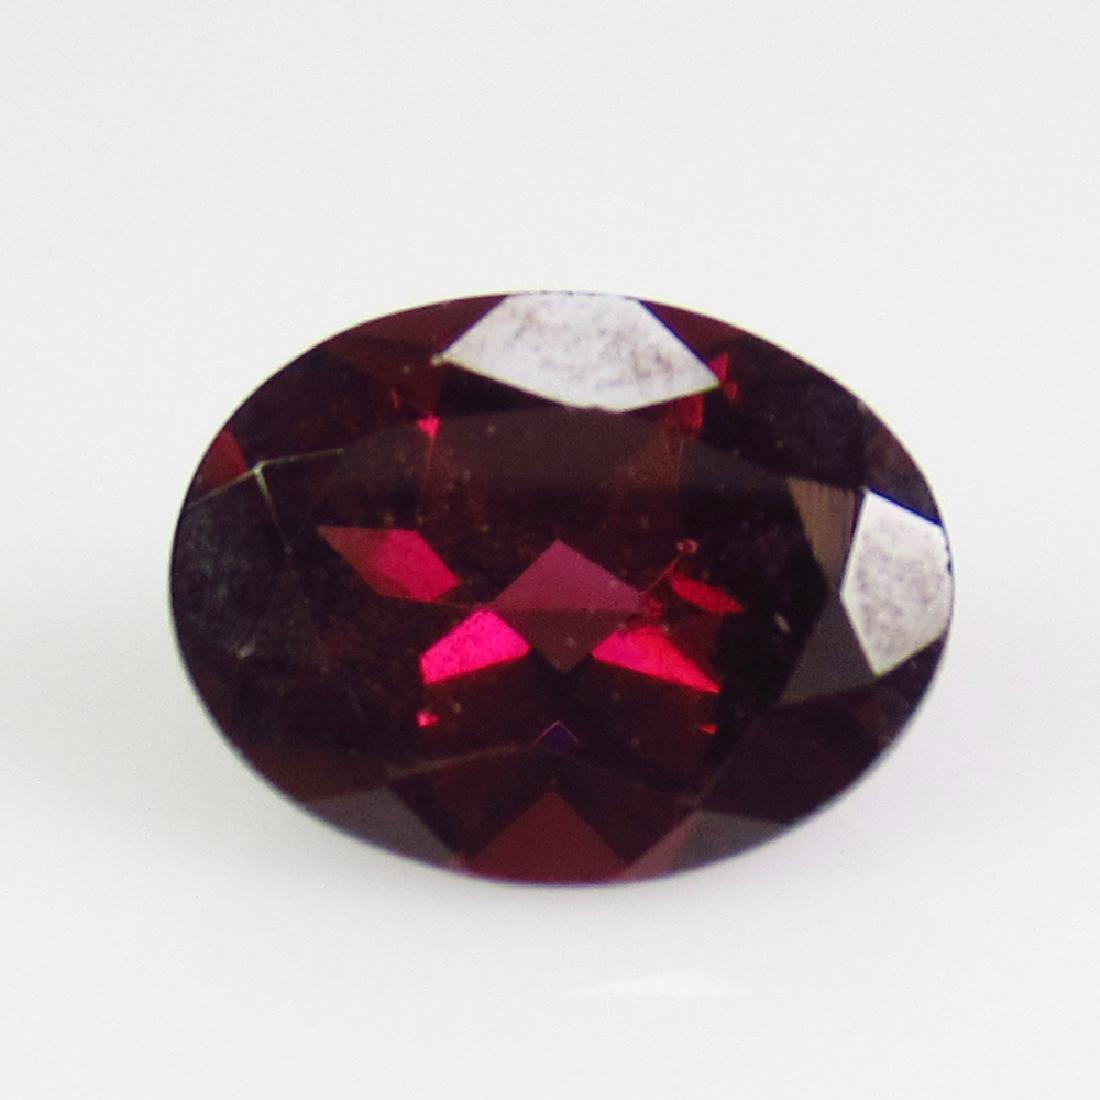 1.59 Ctw Natural Pink Rhodolite Garnet 8X6 mm Oval